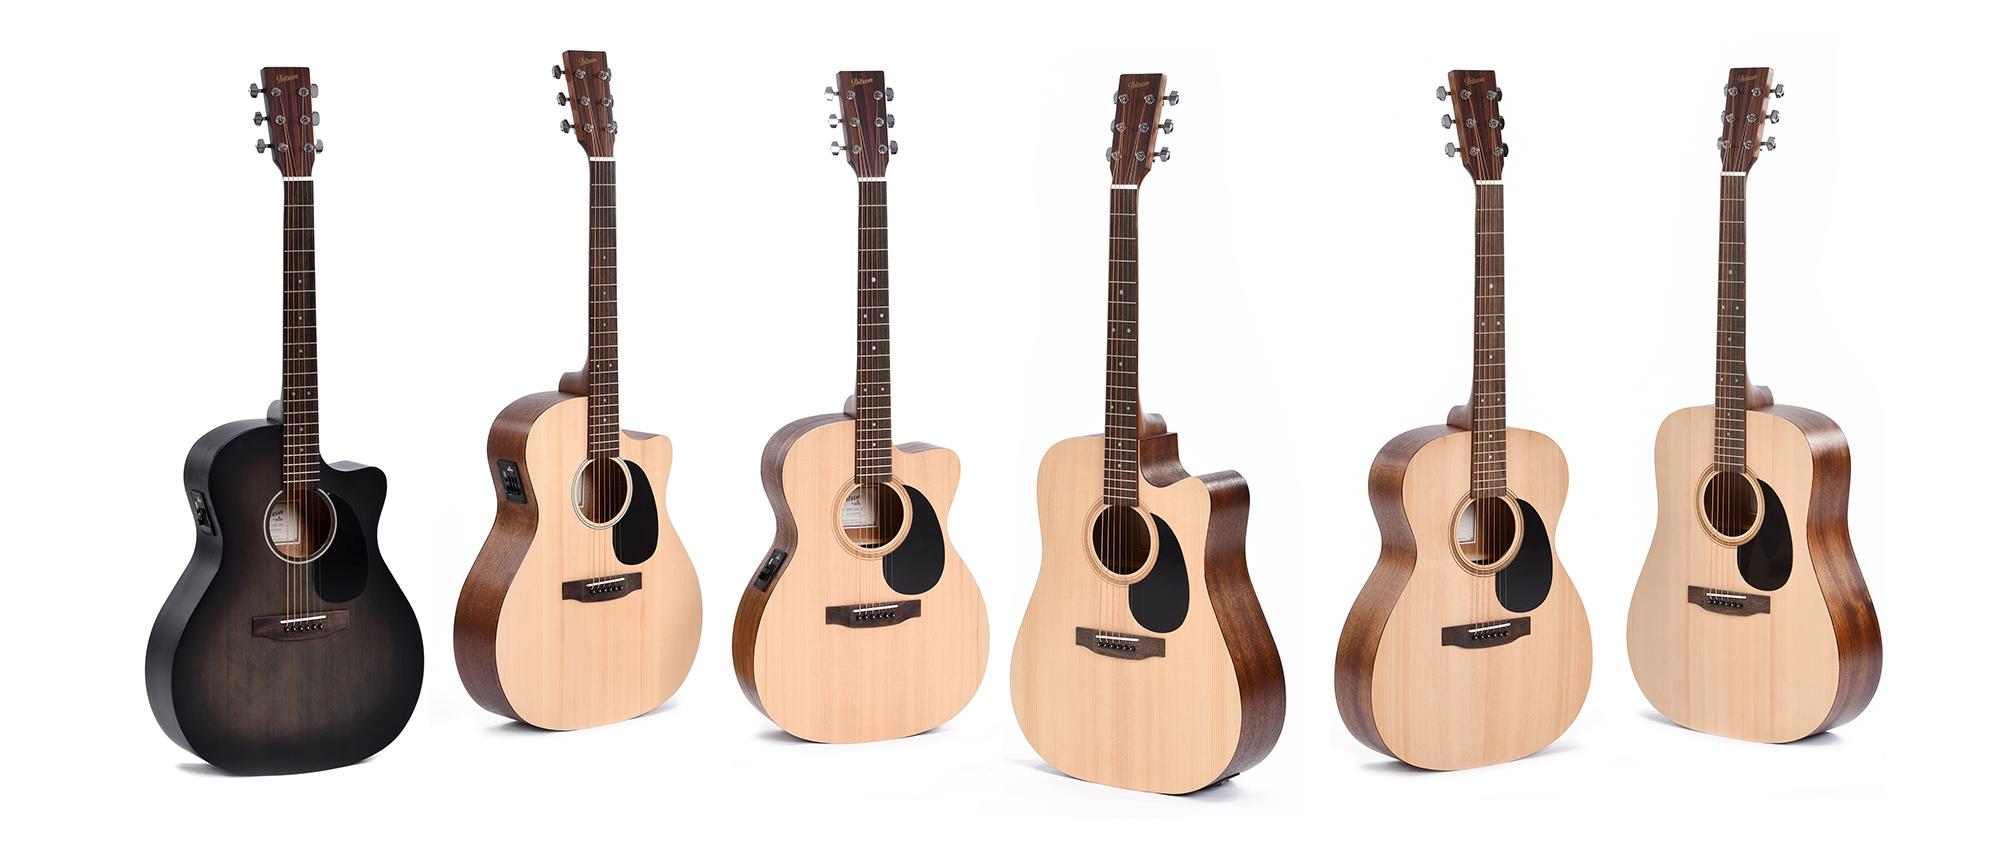 Ditson Guitars